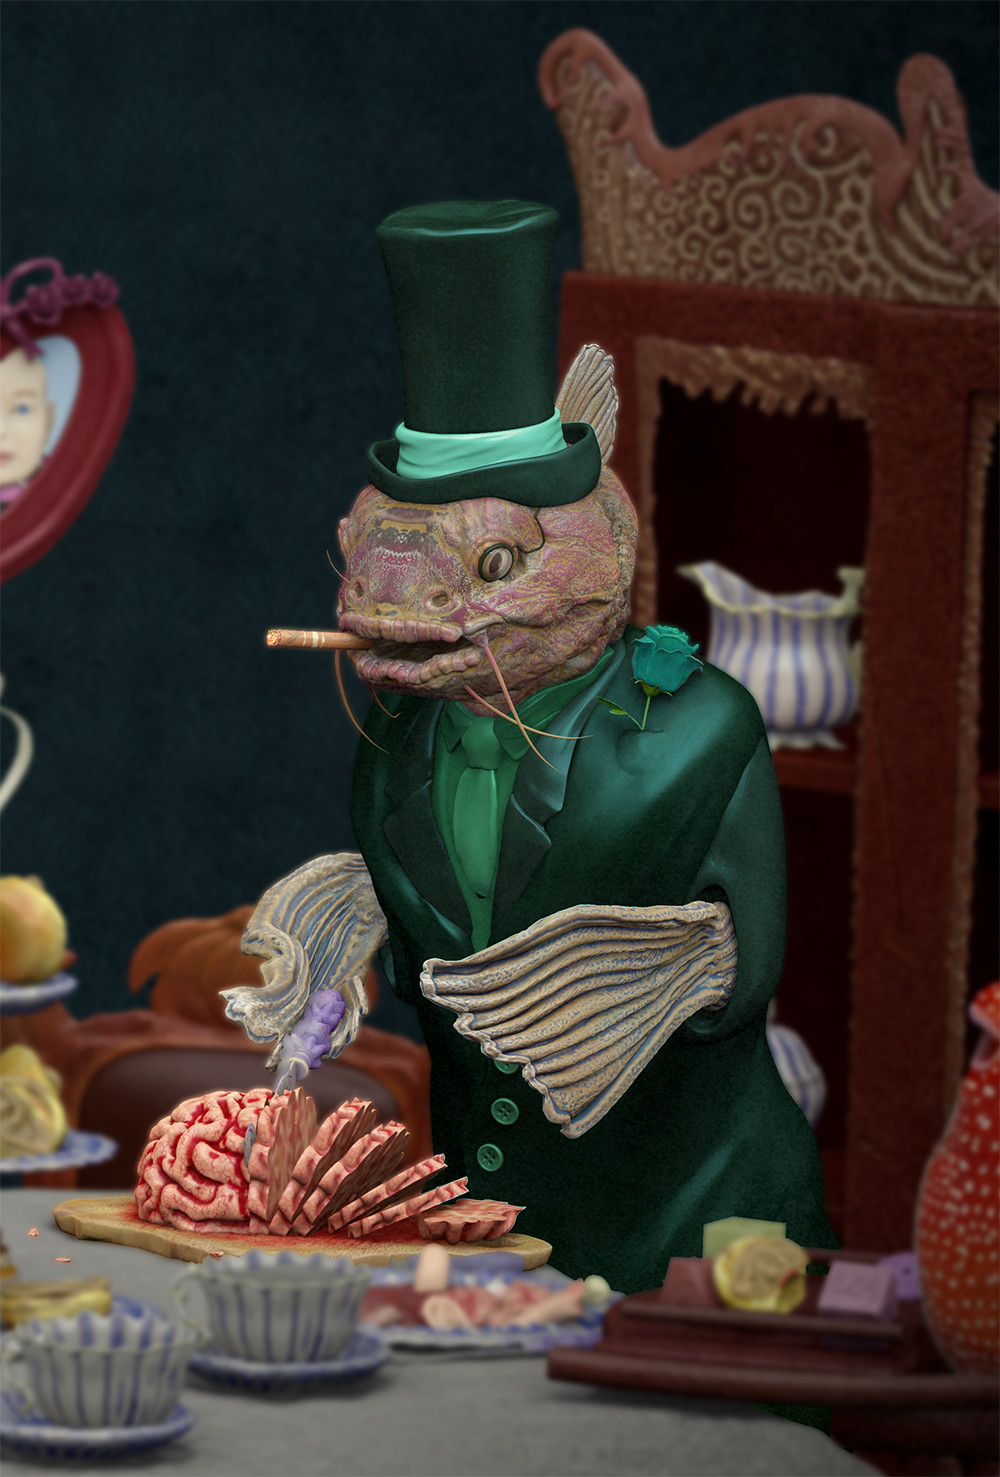 Fish Tea Time - Father Fish